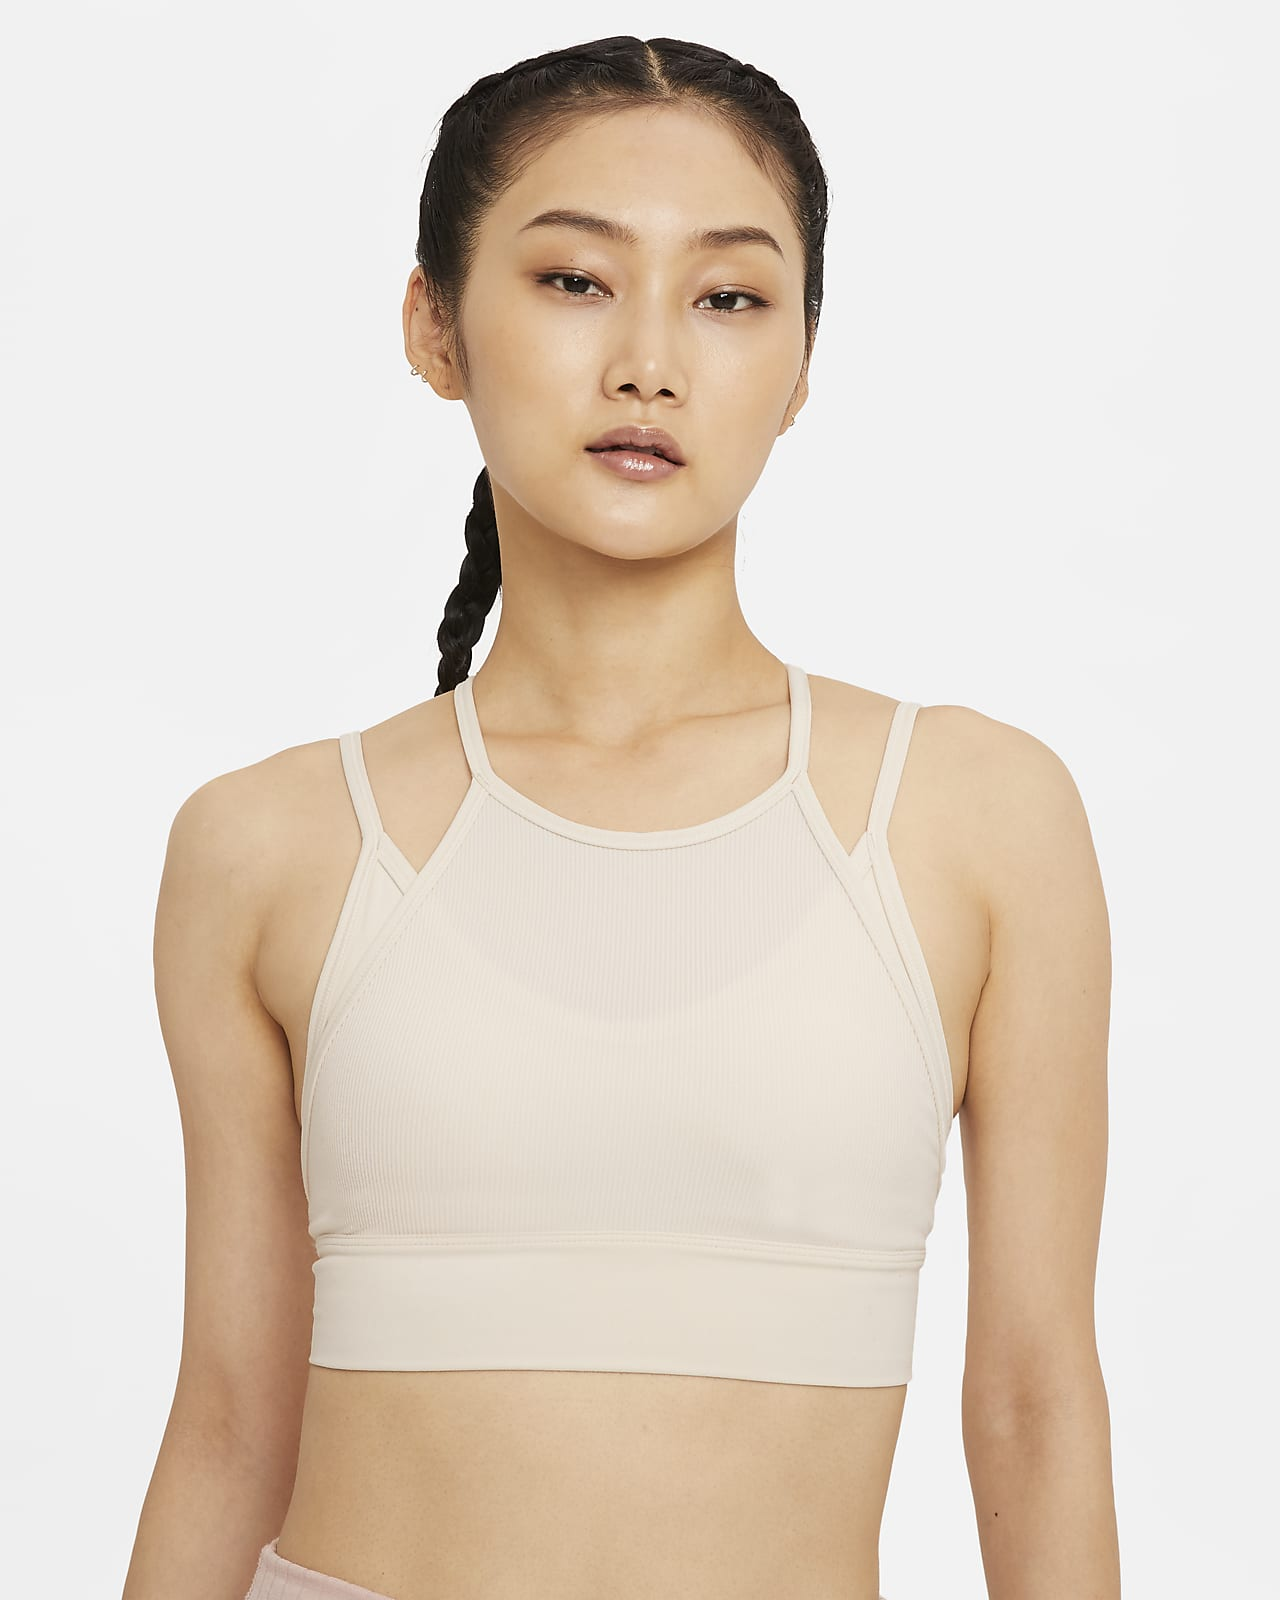 Nike Yoga Indy Novelty Women's Light-Support Padded Sports Bra